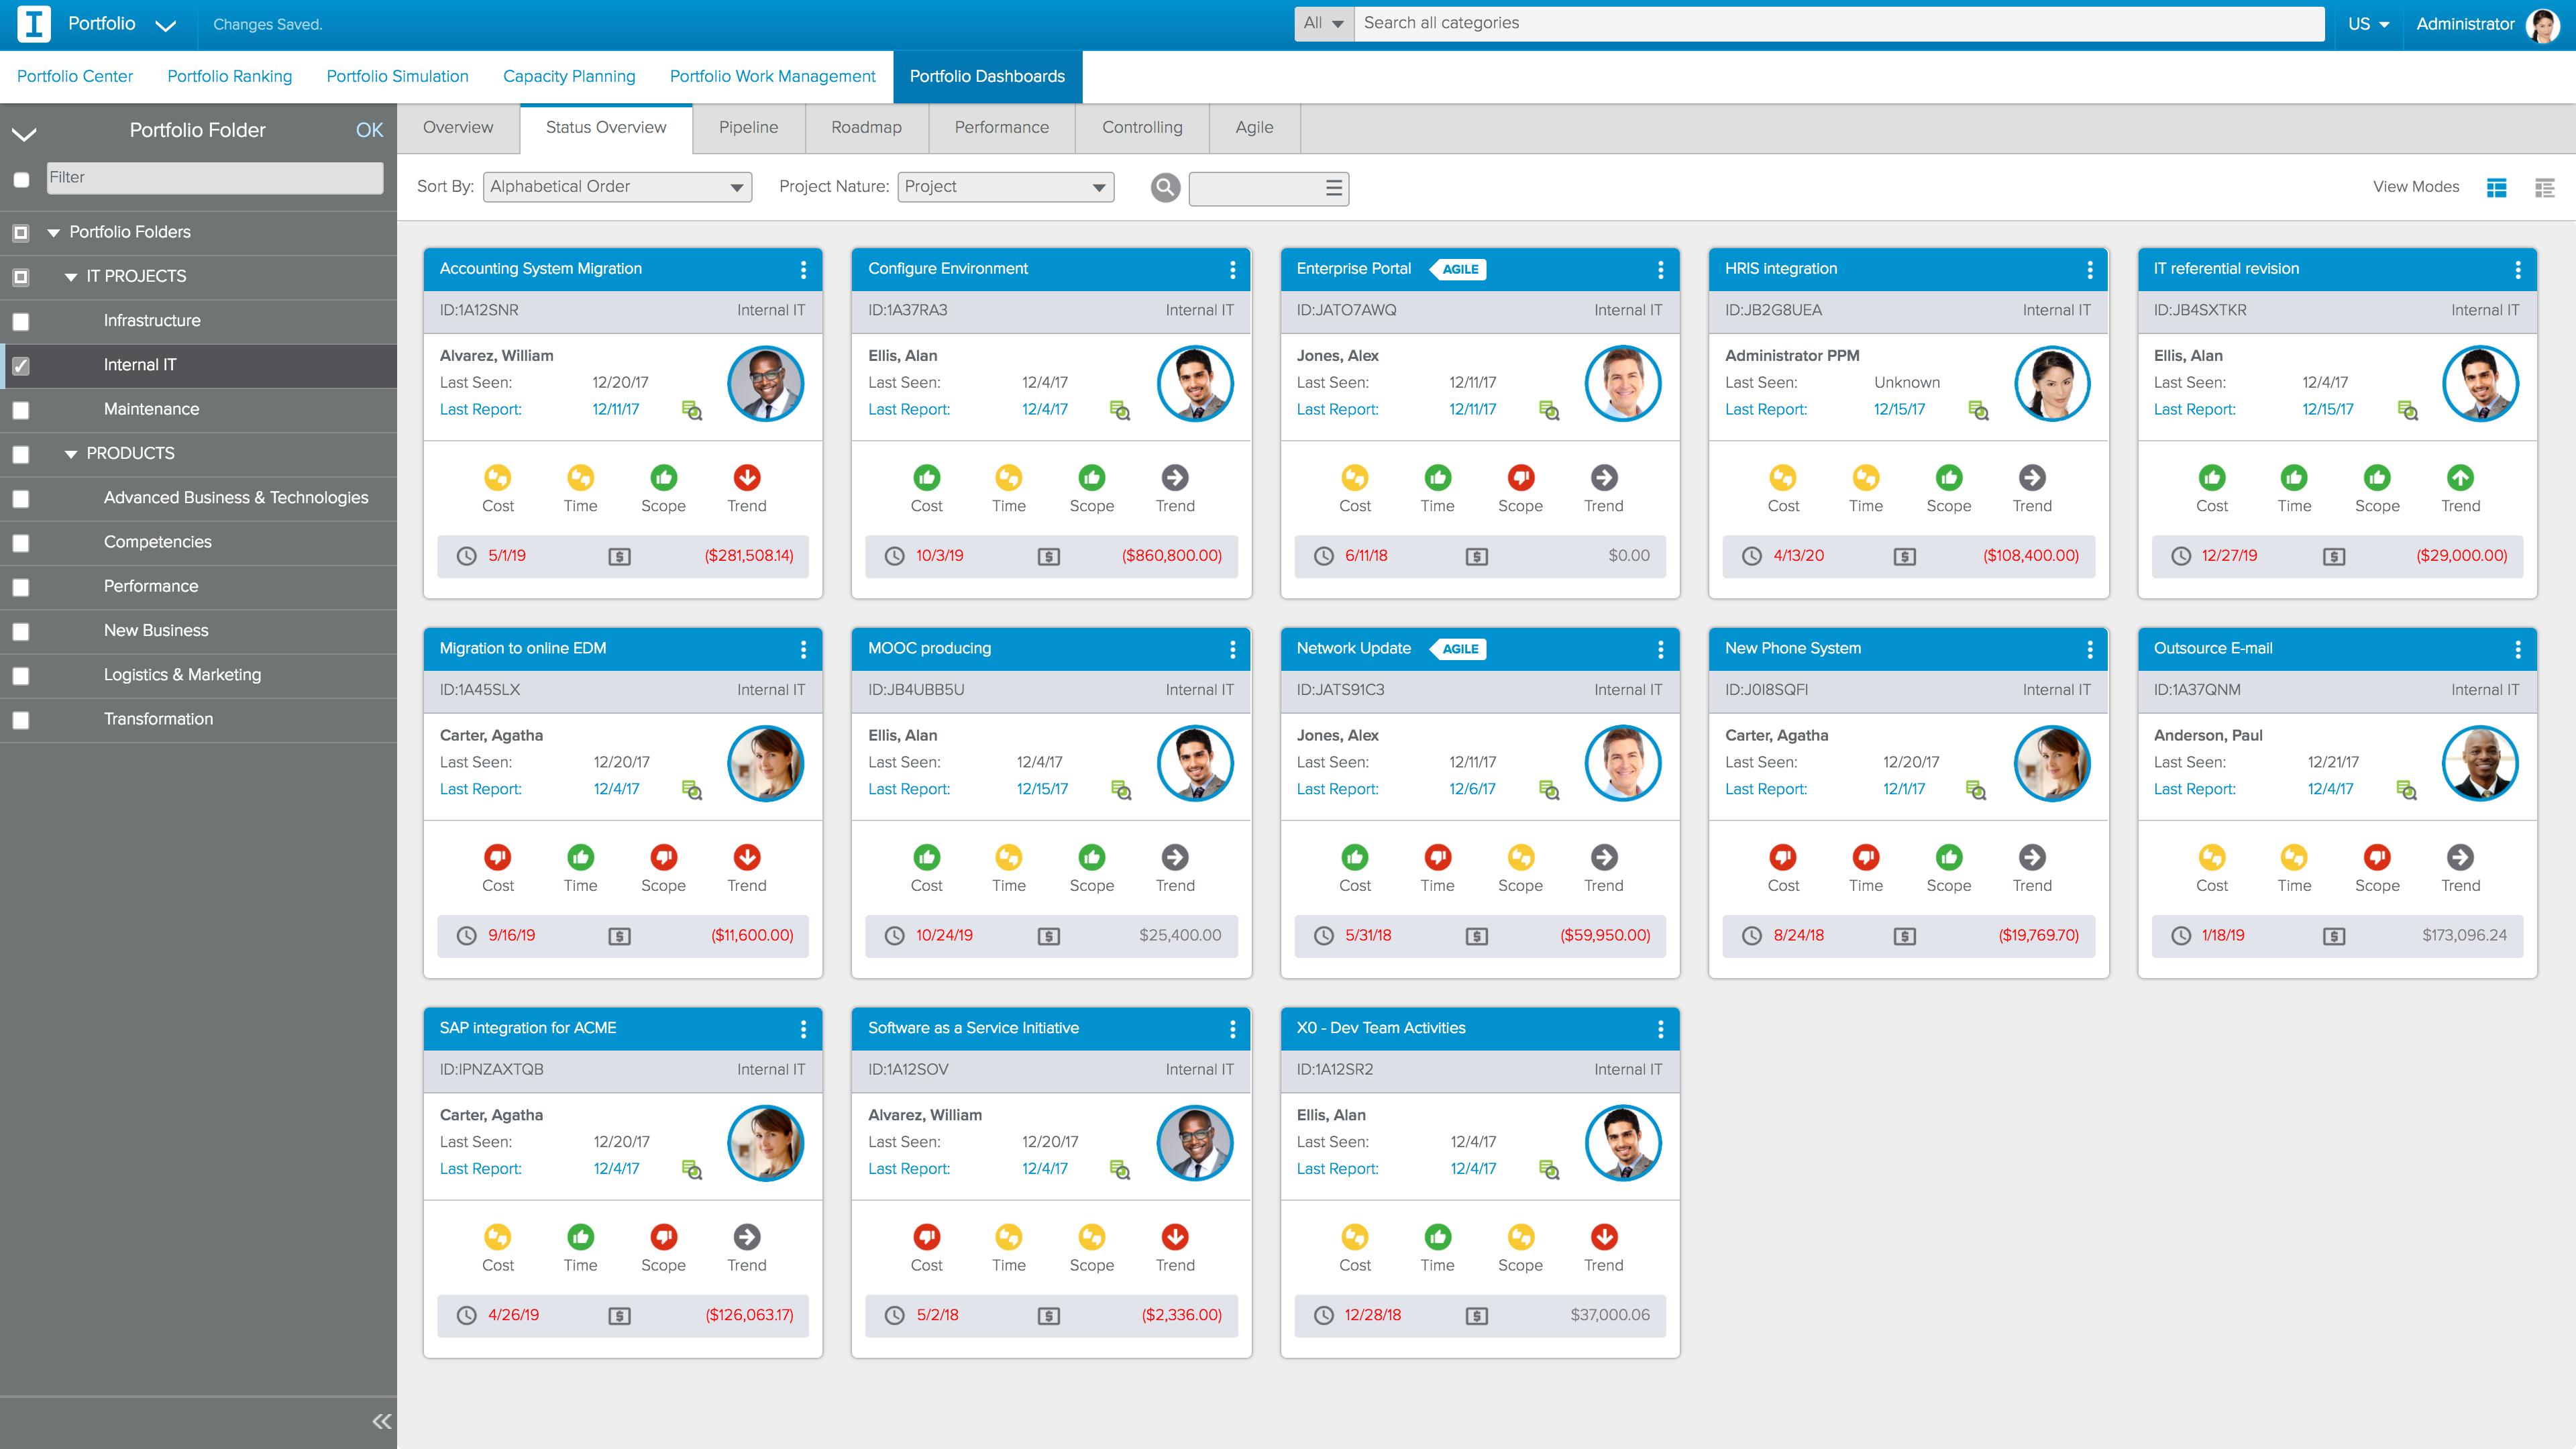 Sciforma Software - Portfolio Status Overview with indicators